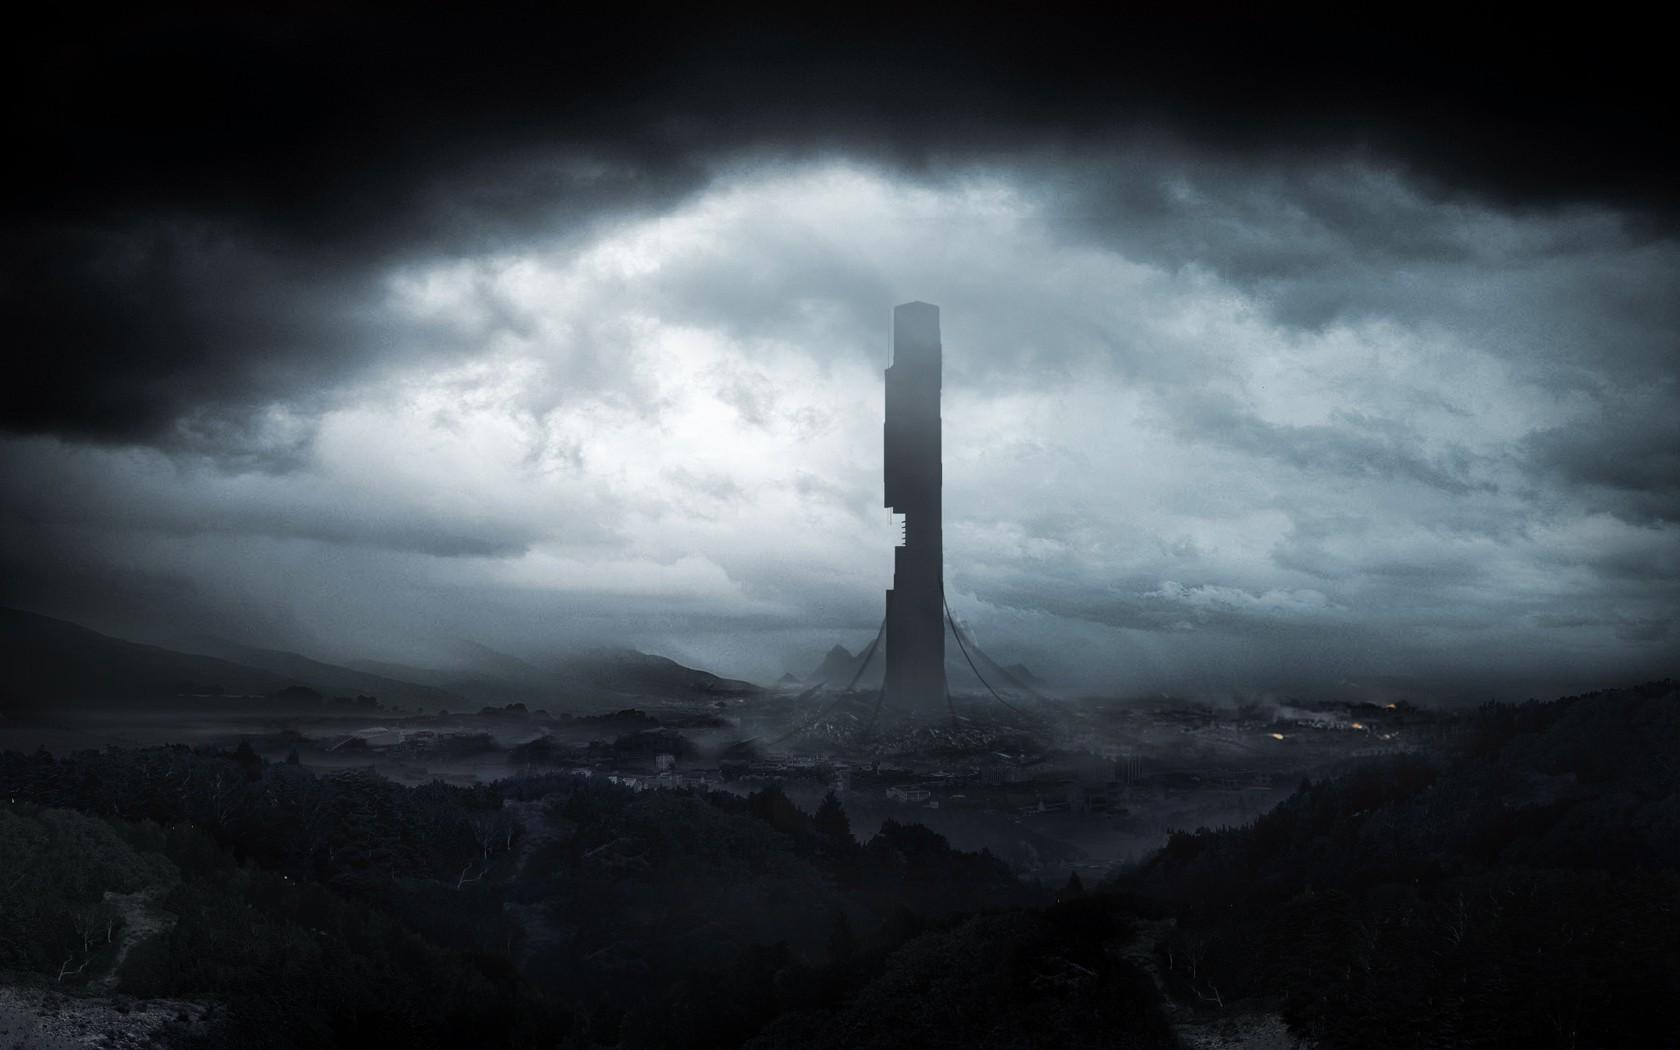 wallpaper : night, sky, snow, storm, tower, mist, wind, half life